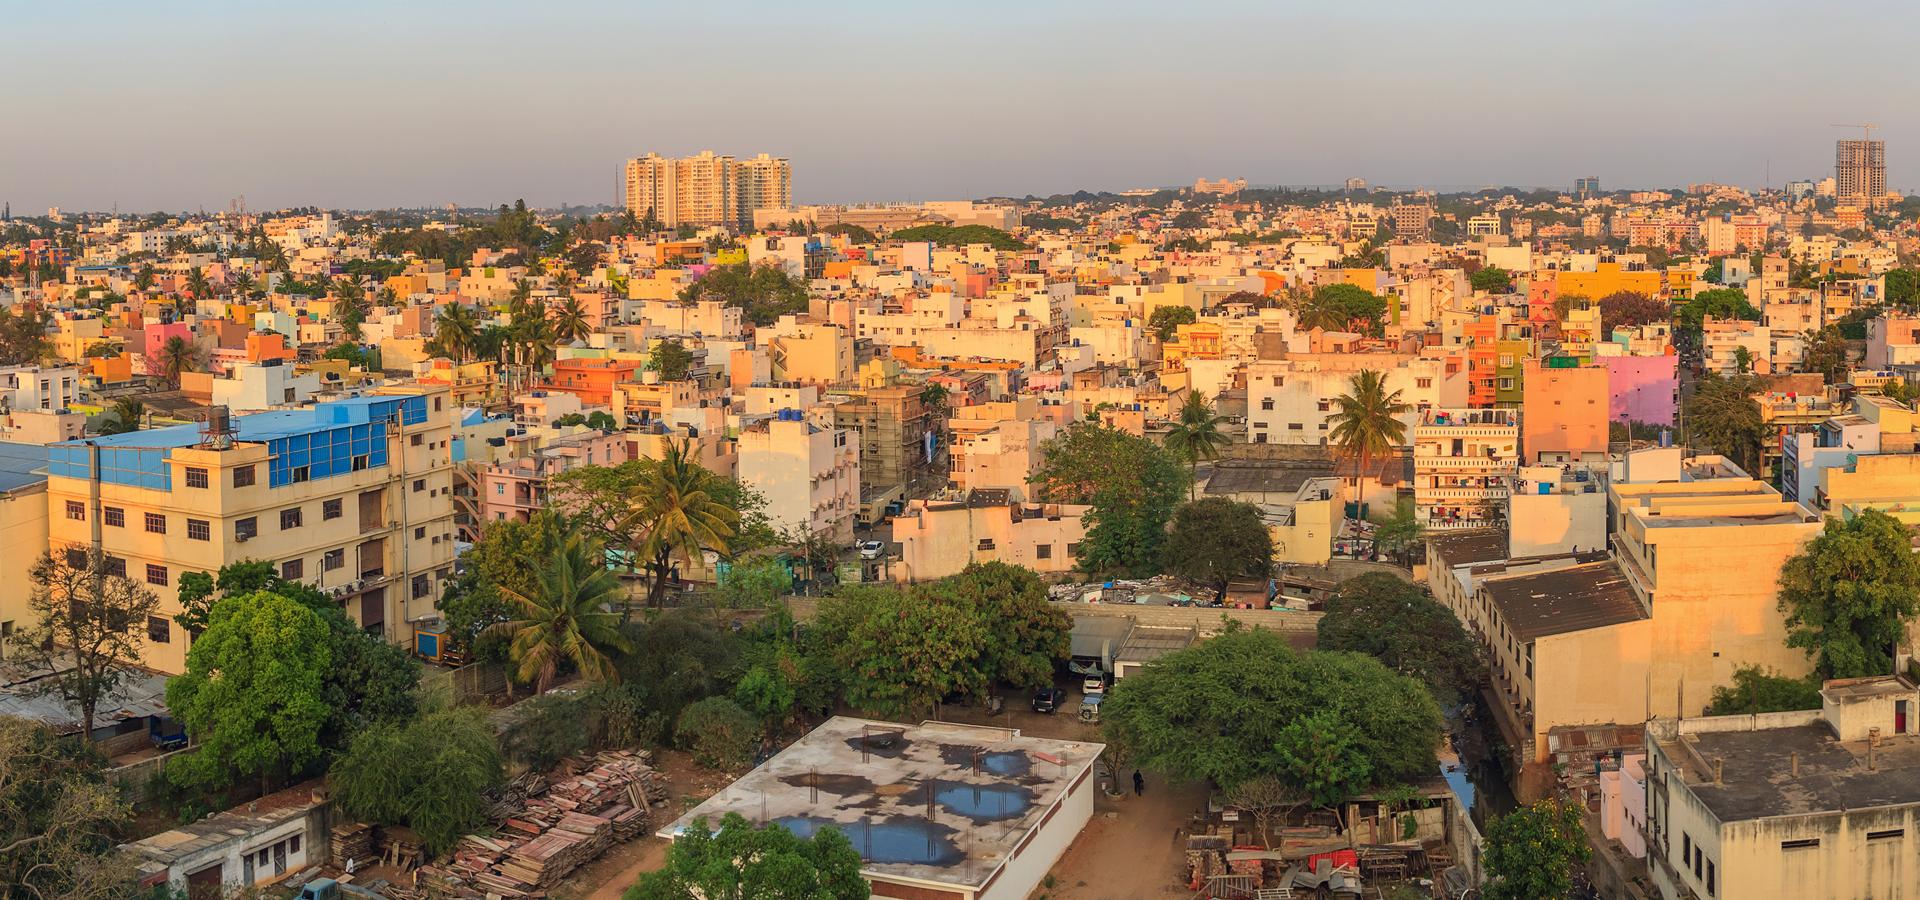 Peer-to-peer advisory in Bangalore, Karnataka, India